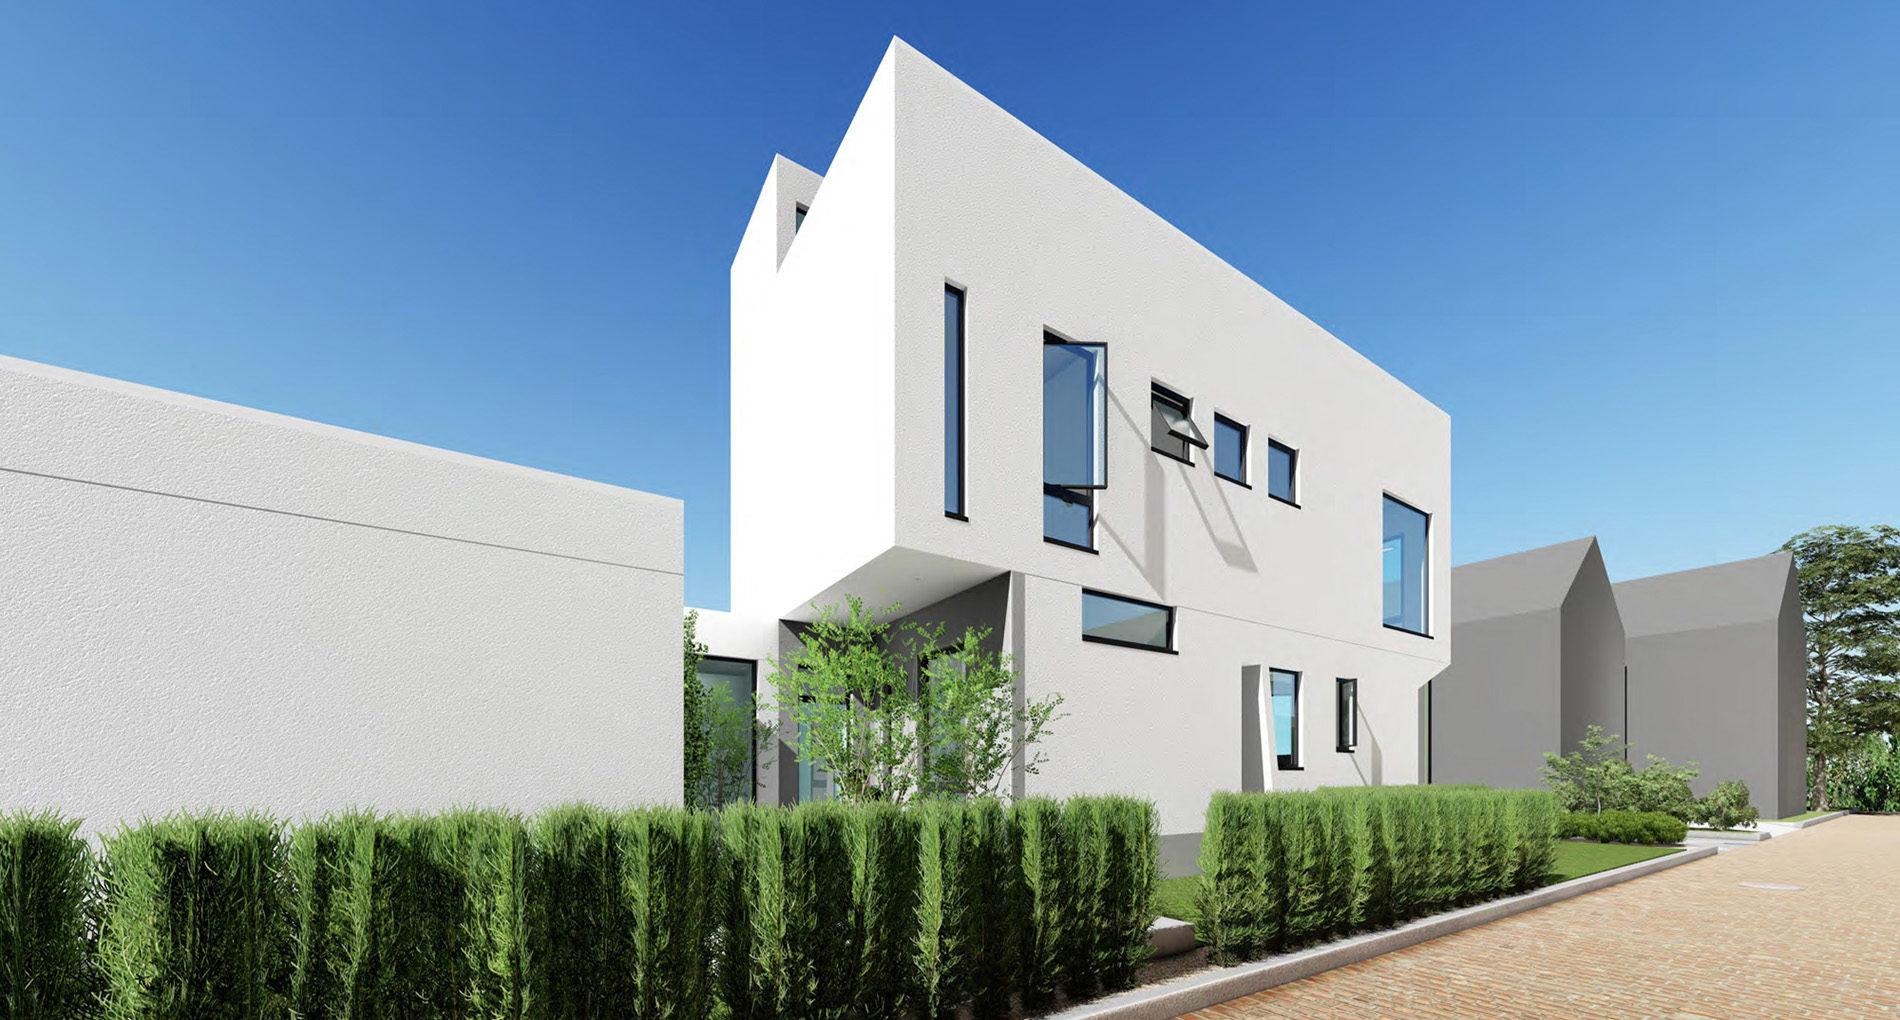 Smith Residence 20180214 9